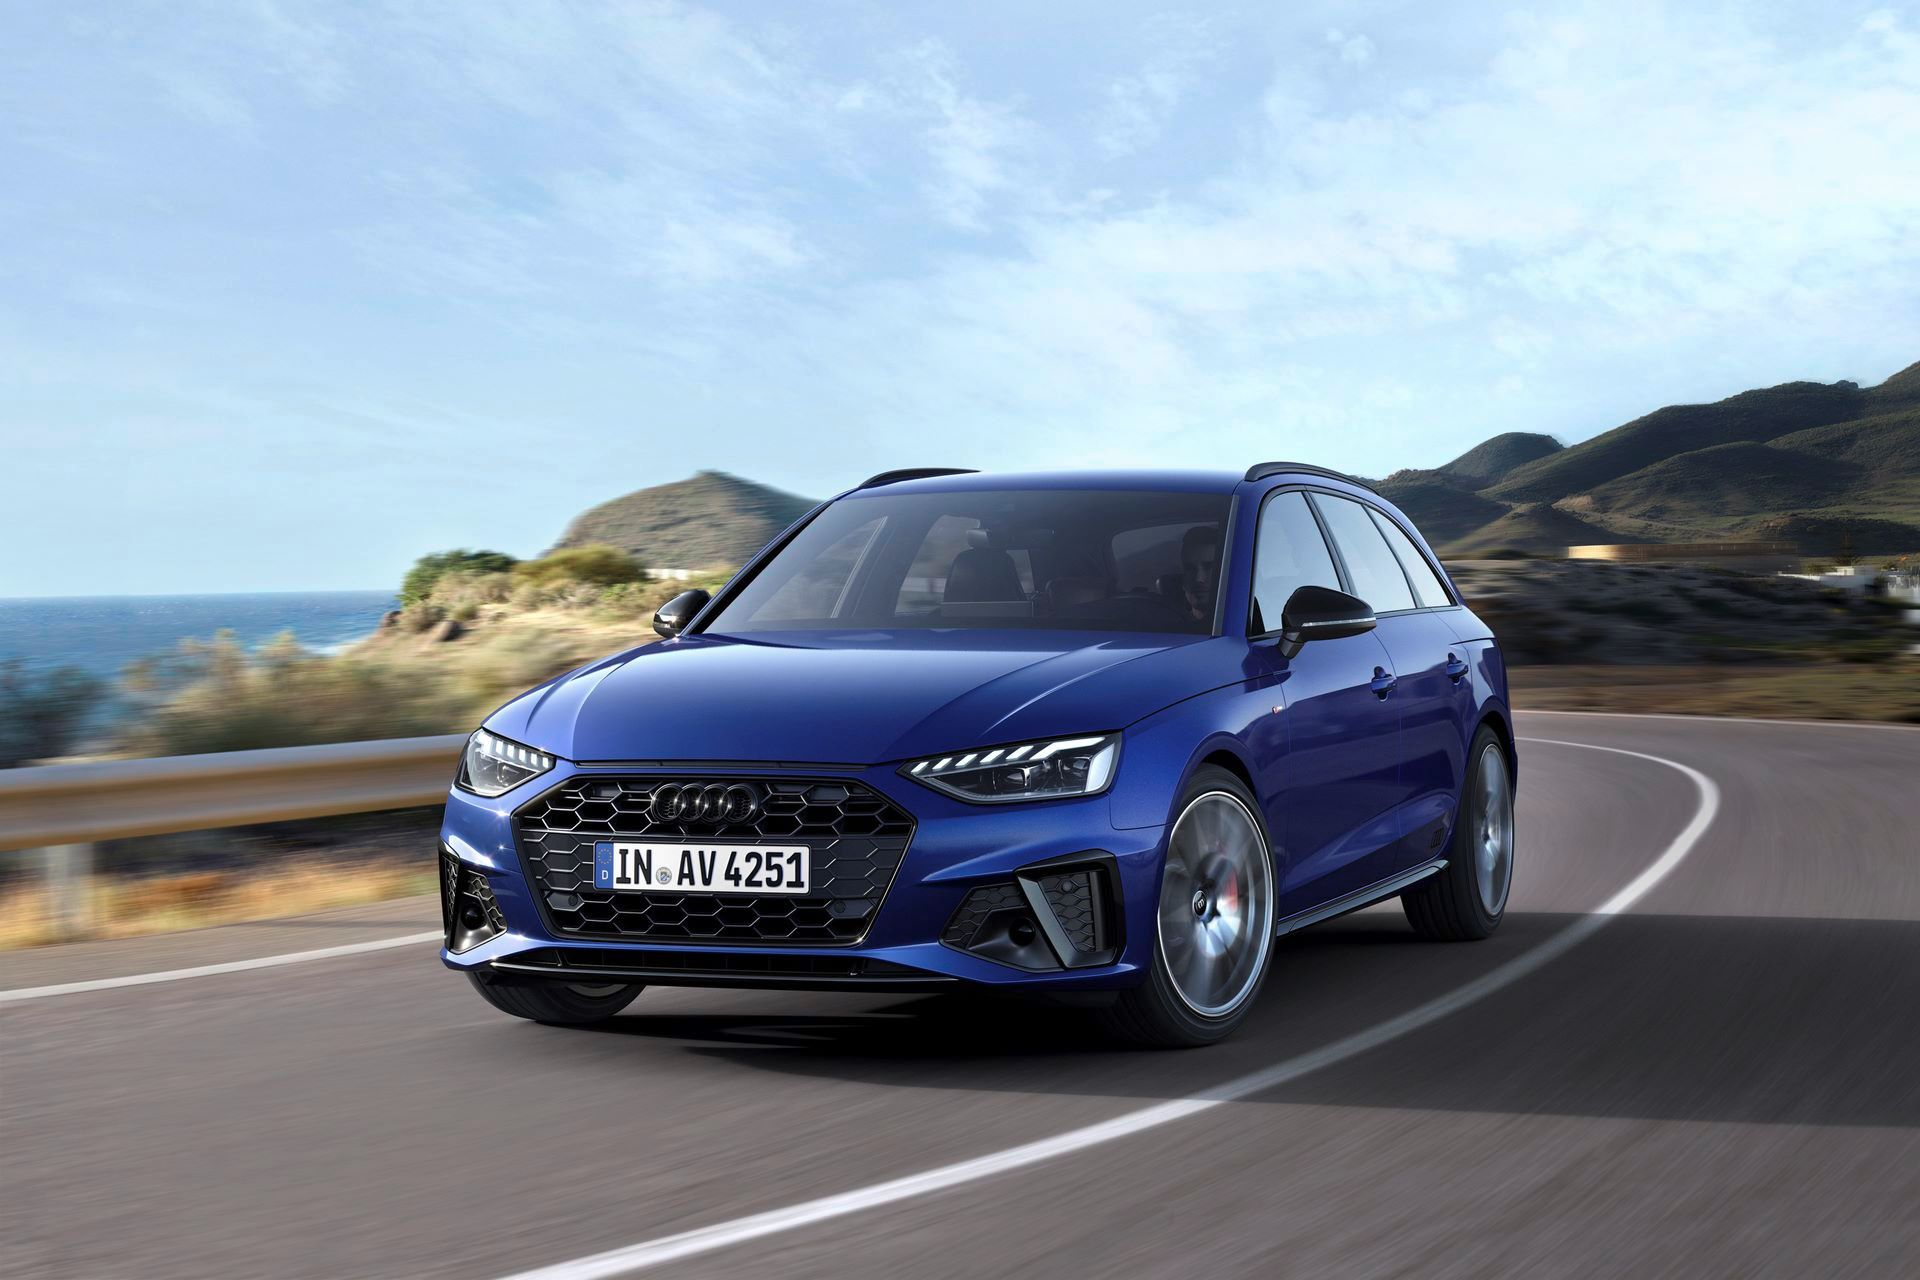 Audi-A4-A5-Q7-Q8-Competition-And-Competition-Plus-Trims-58